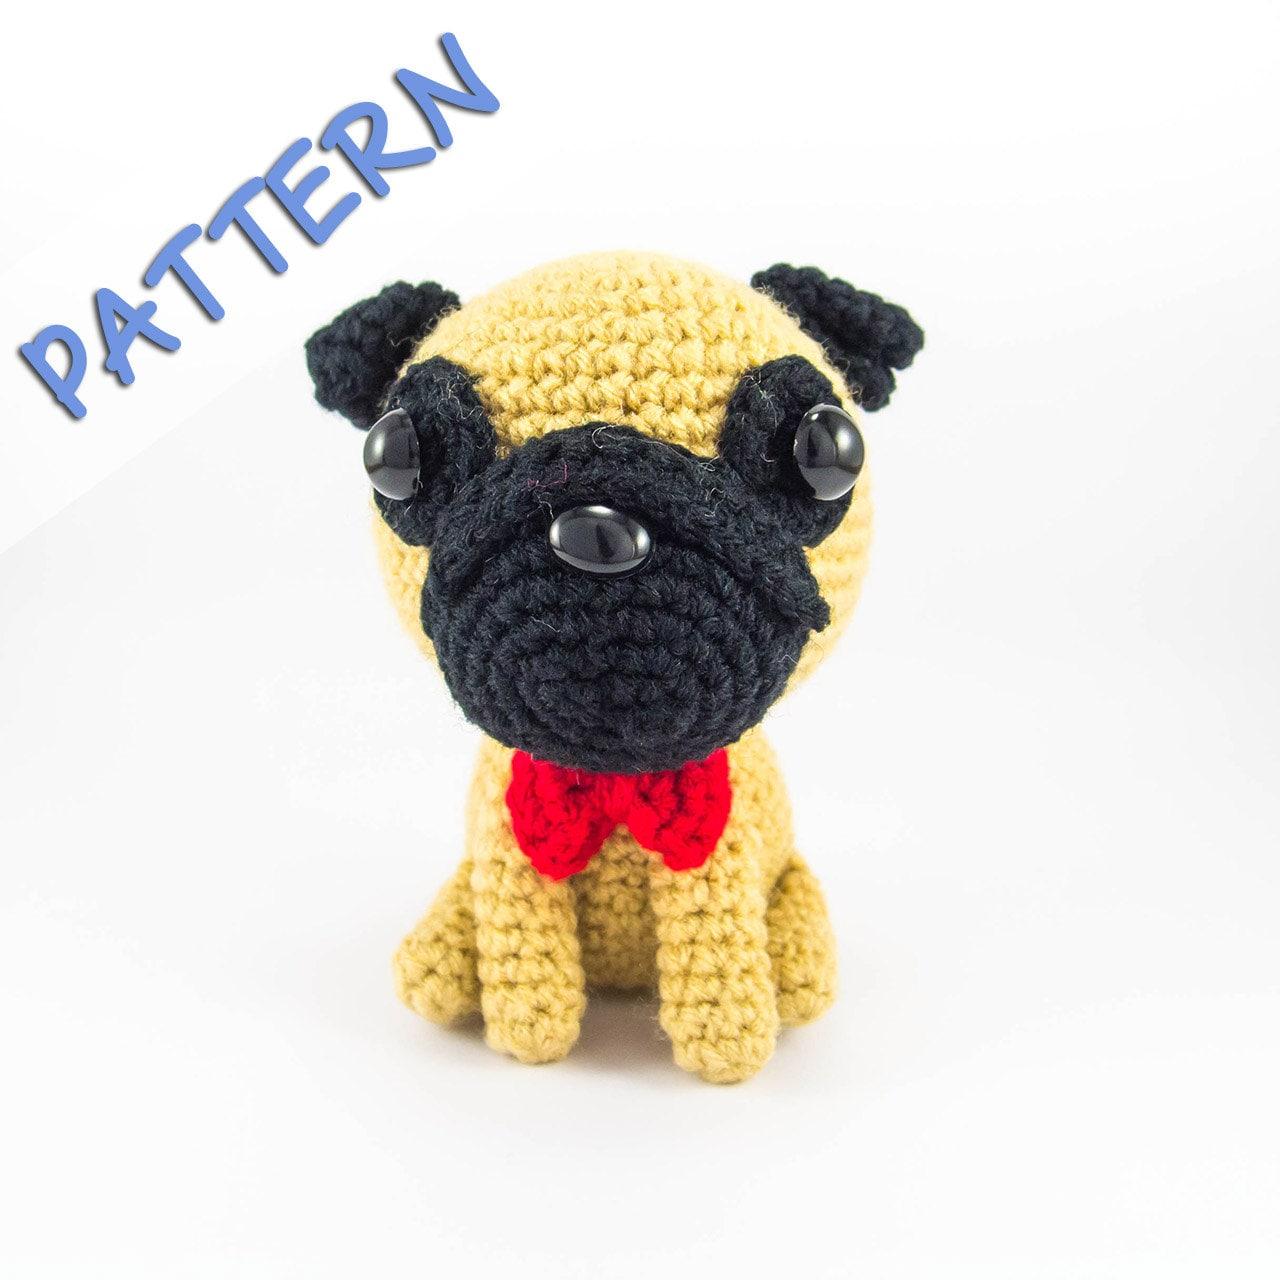 Pug Crochet Pattern Pug Amigurumi Pattern Dog Crochet | Etsy